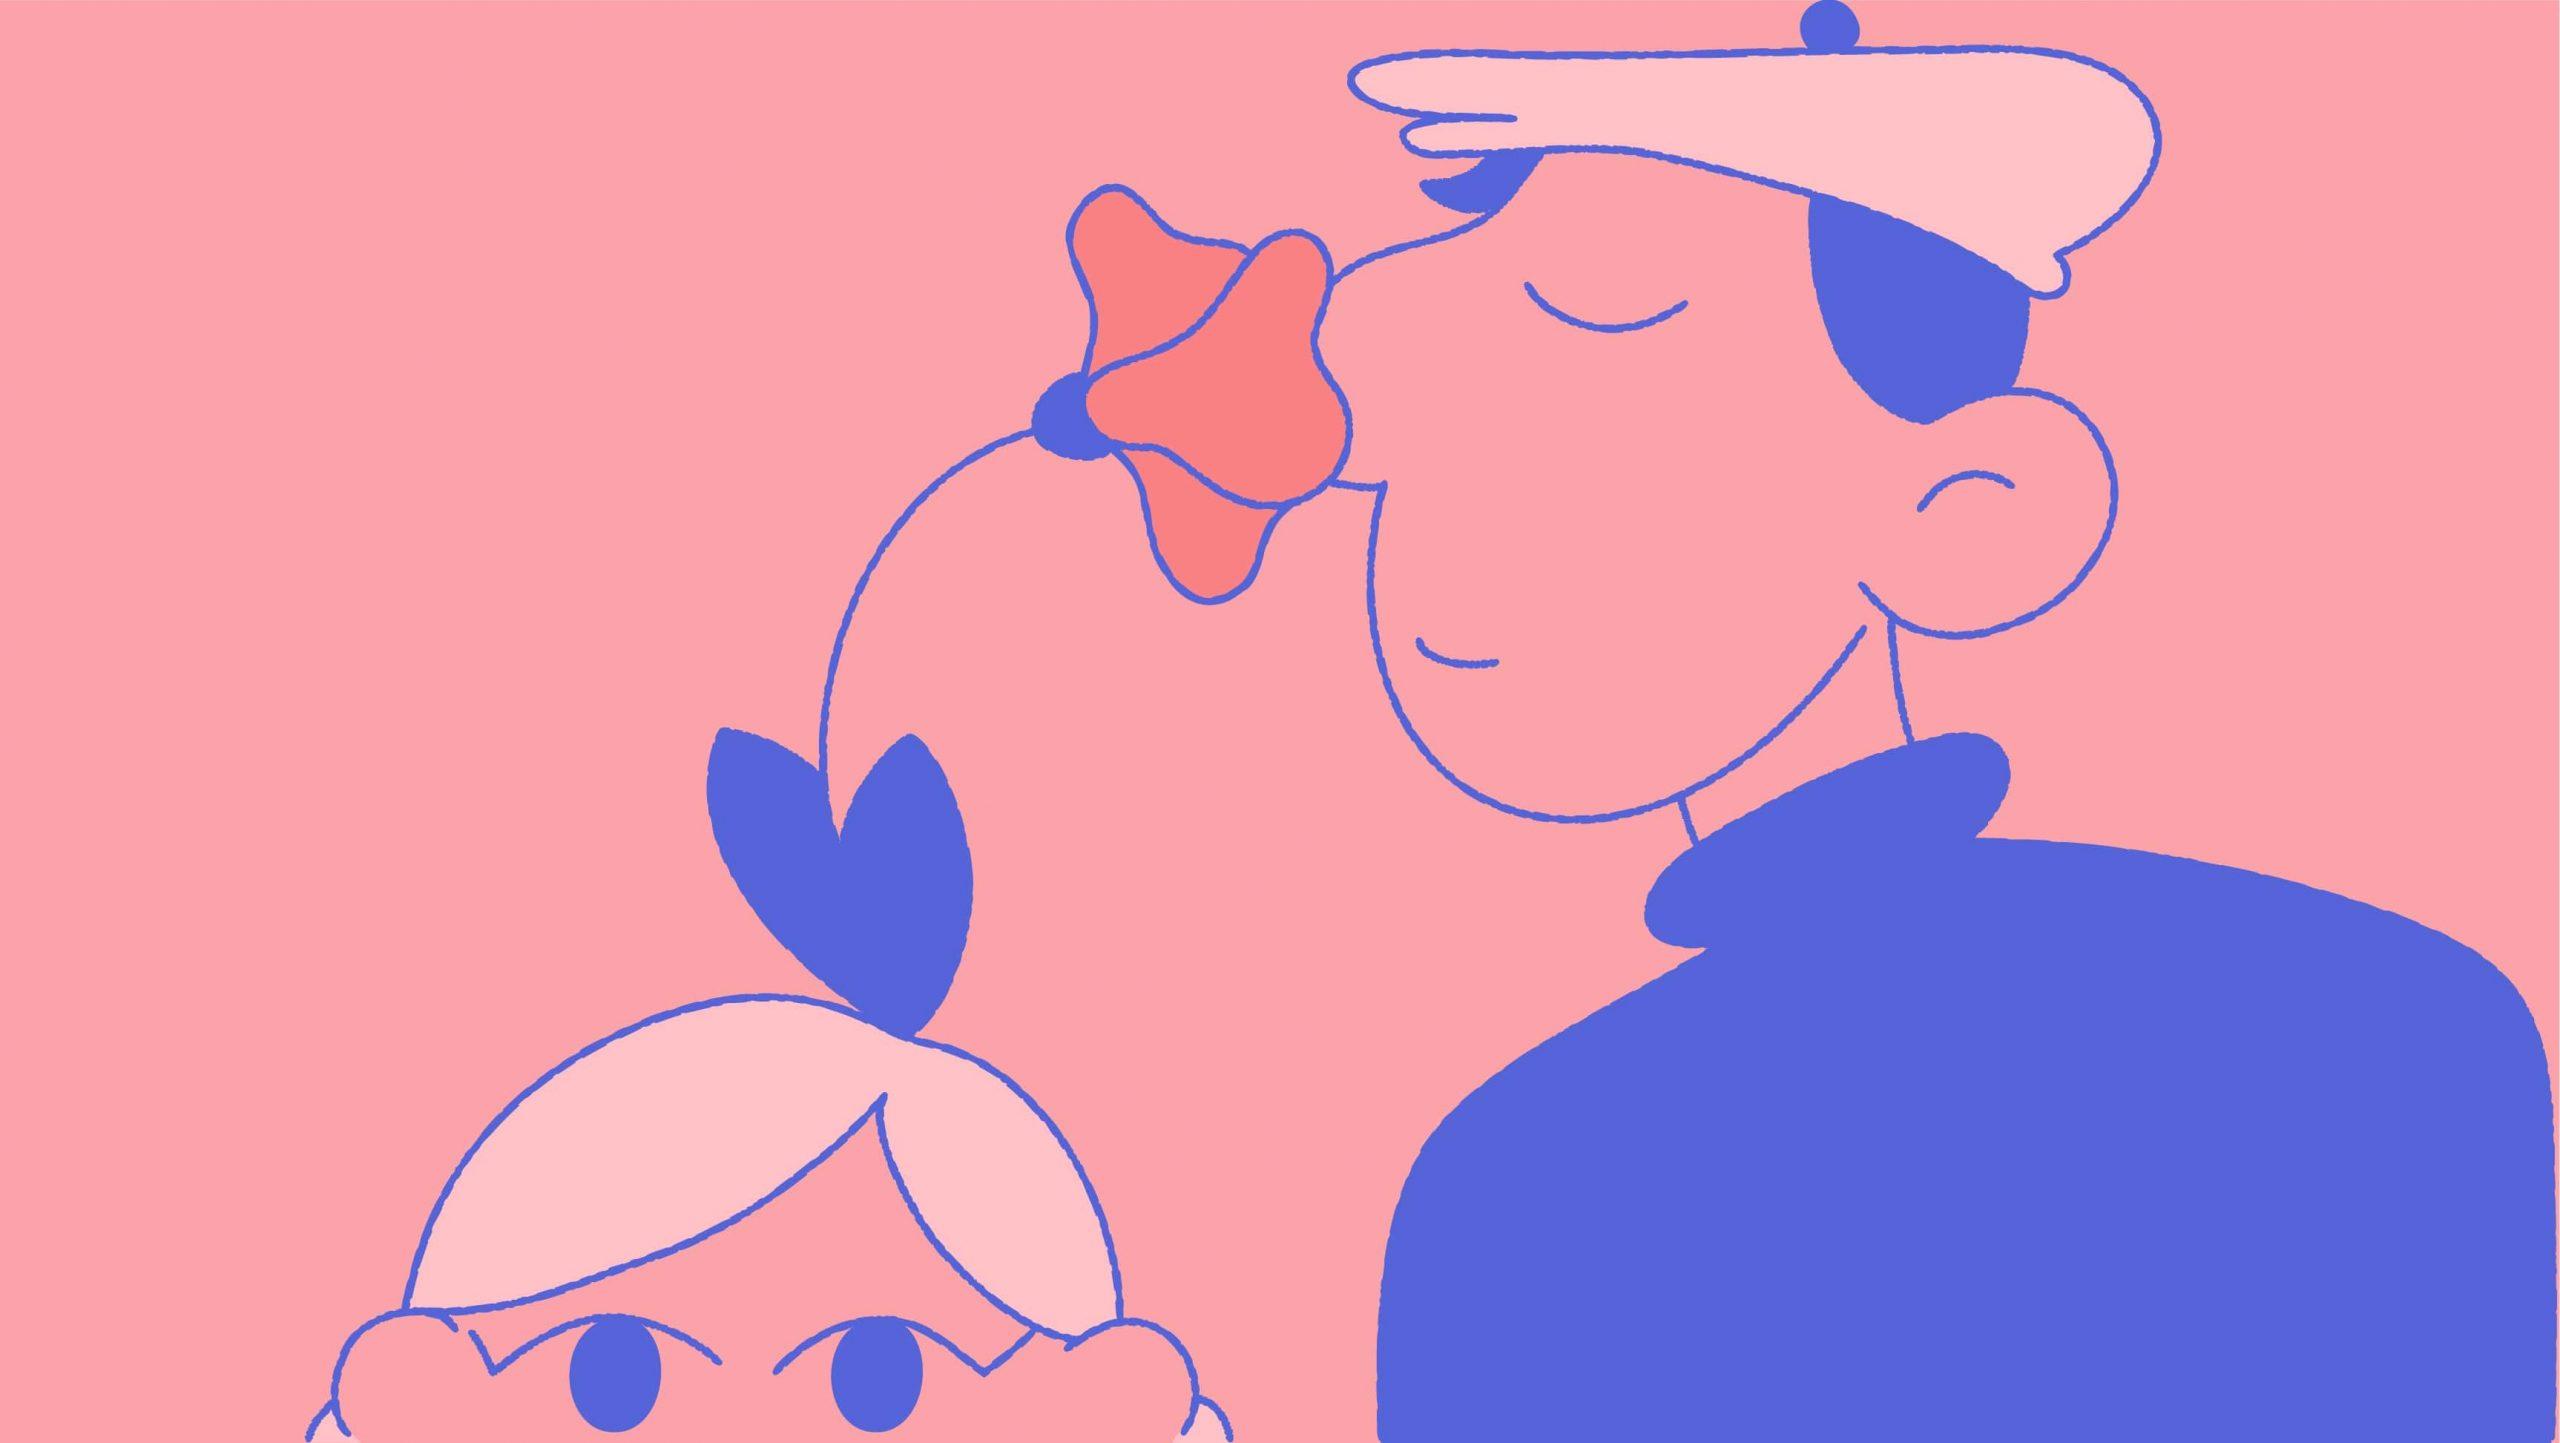 Partner's scent